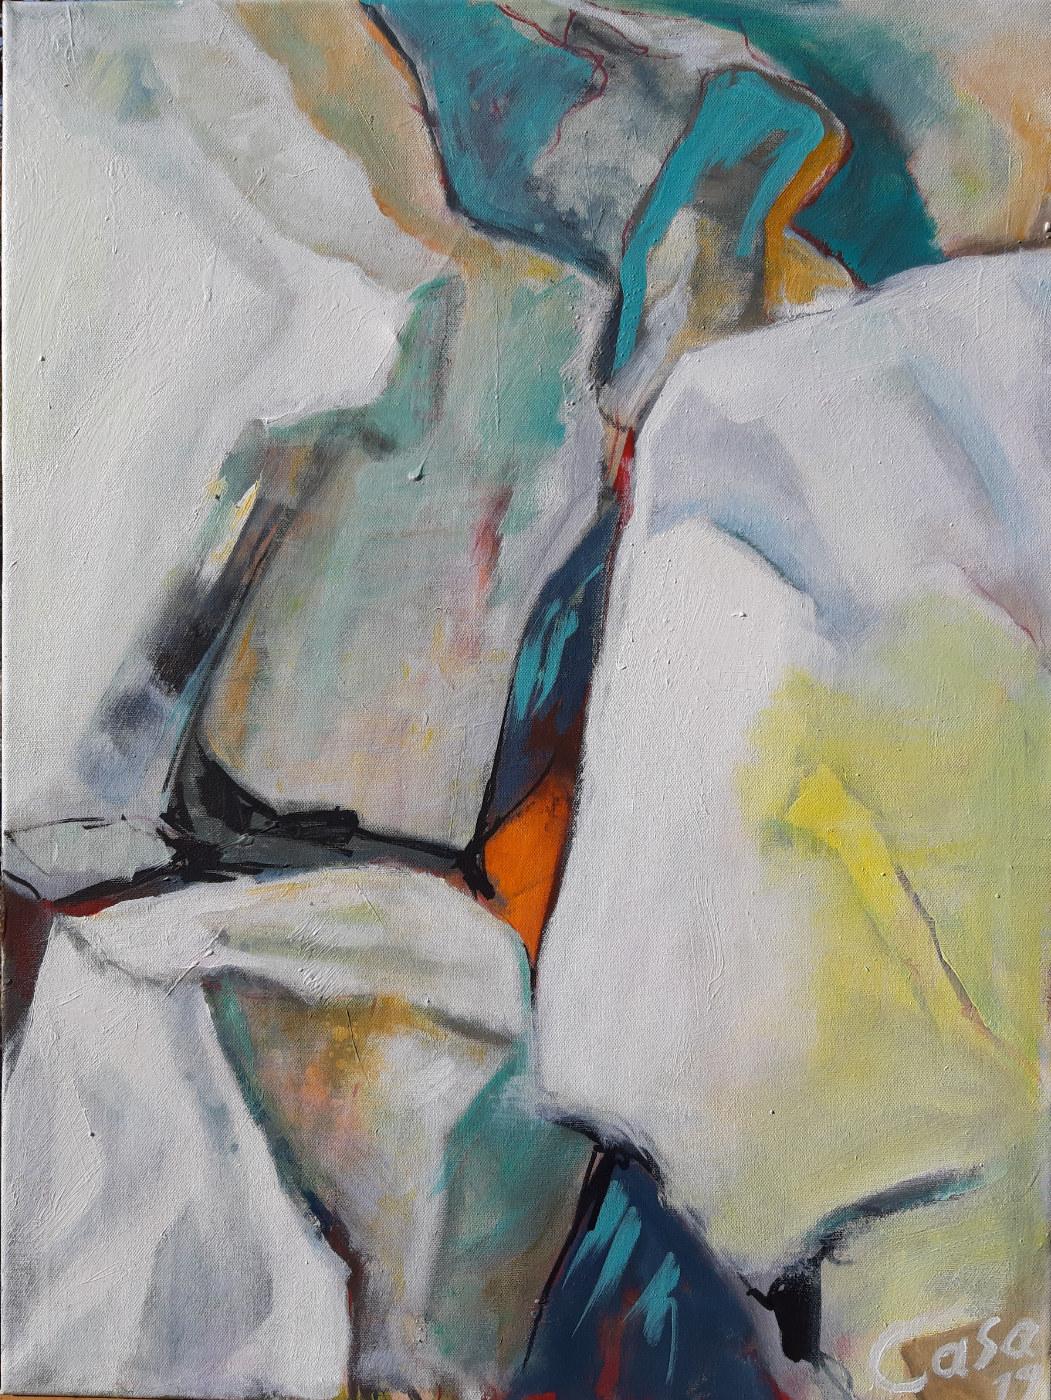 ohne Titel - Acryl auf Leinwand - 80 x 60 cm